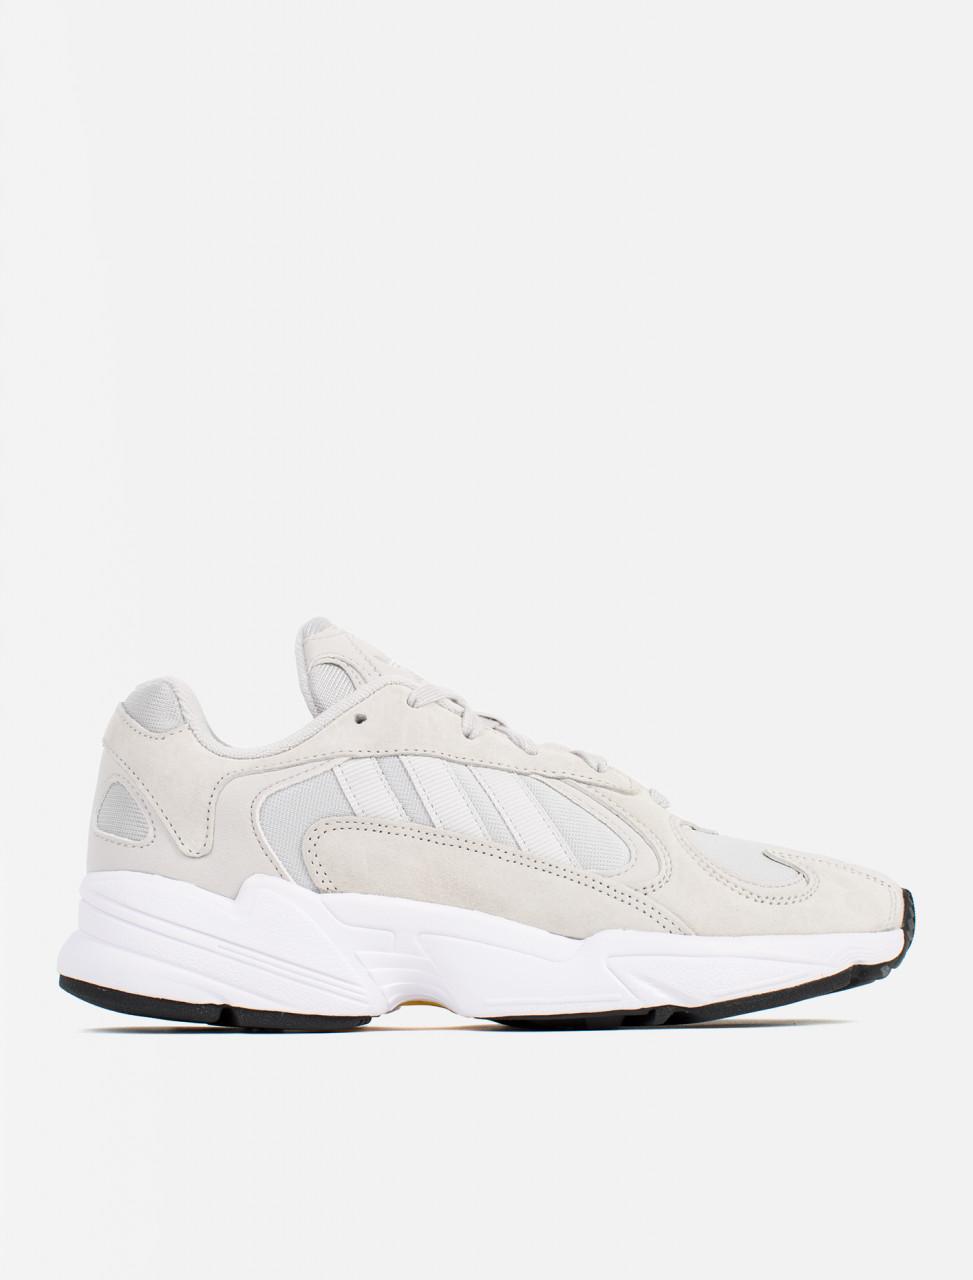 d172f00907d Adidas Yung-1 Sneaker